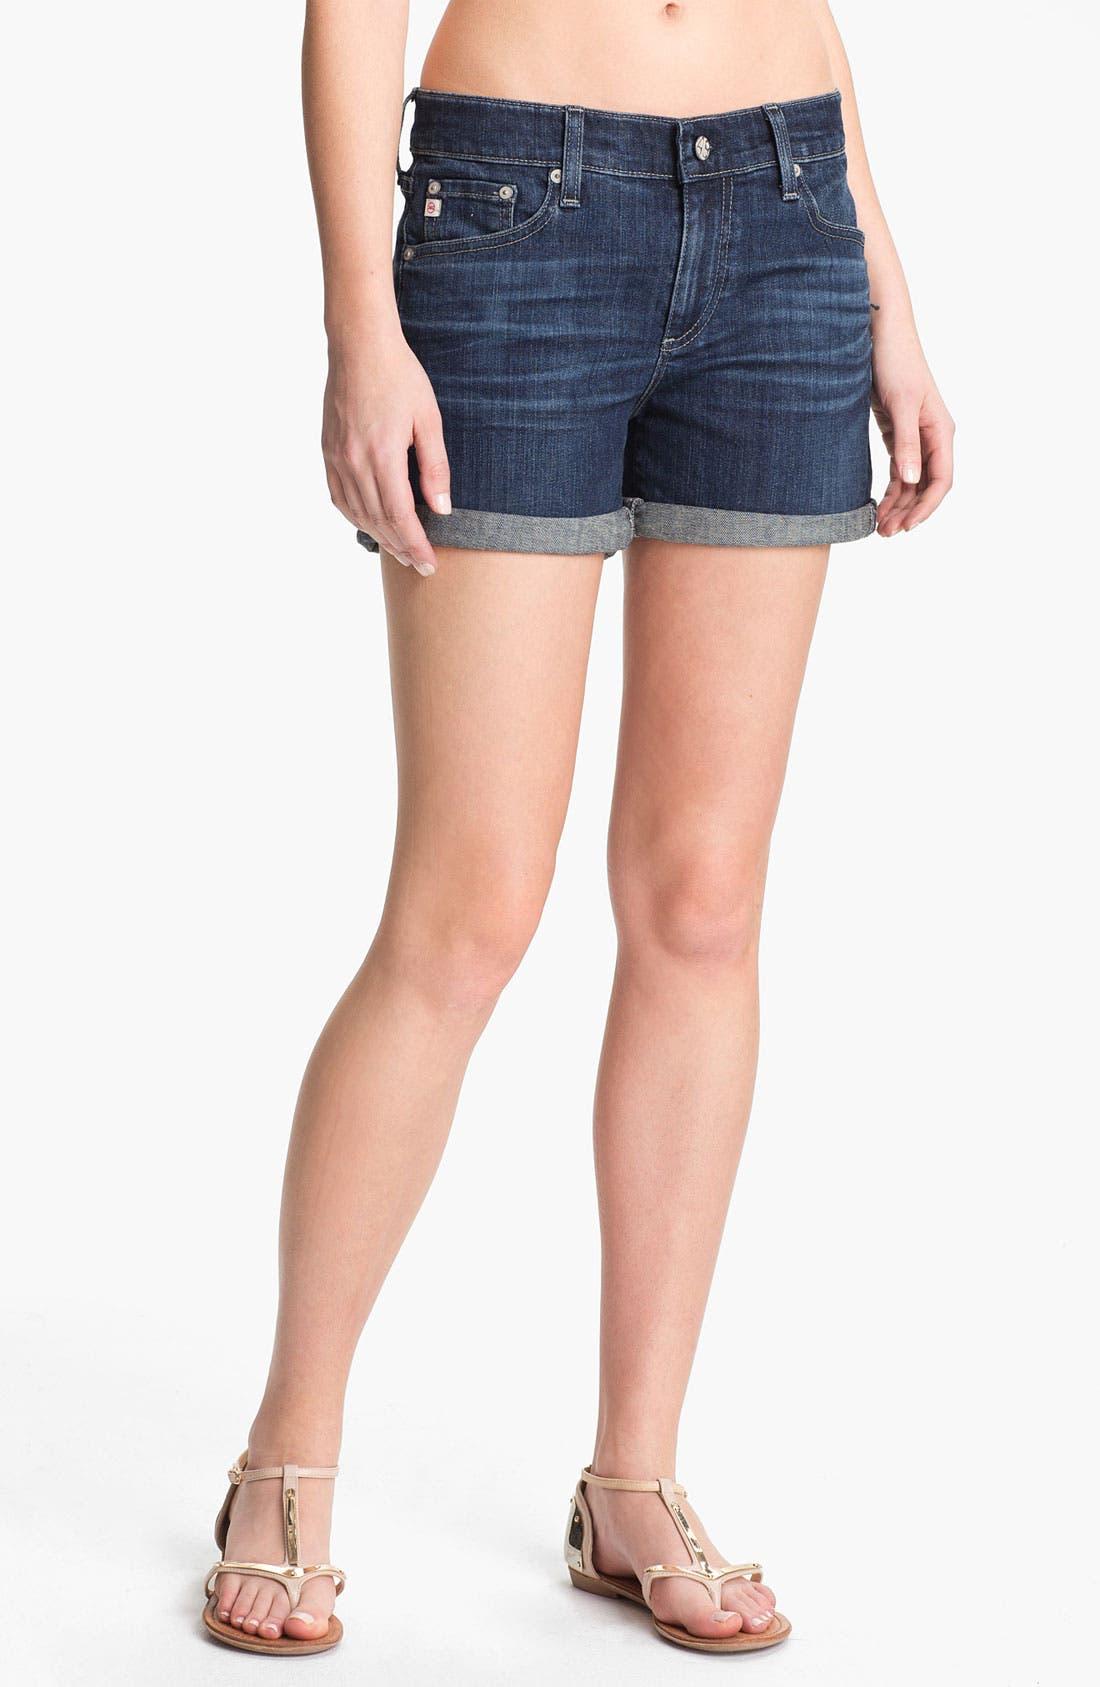 Alternate Image 1 Selected - AG 'Hailey' Cuff Denim Shorts (Four Year Brisk Blue)